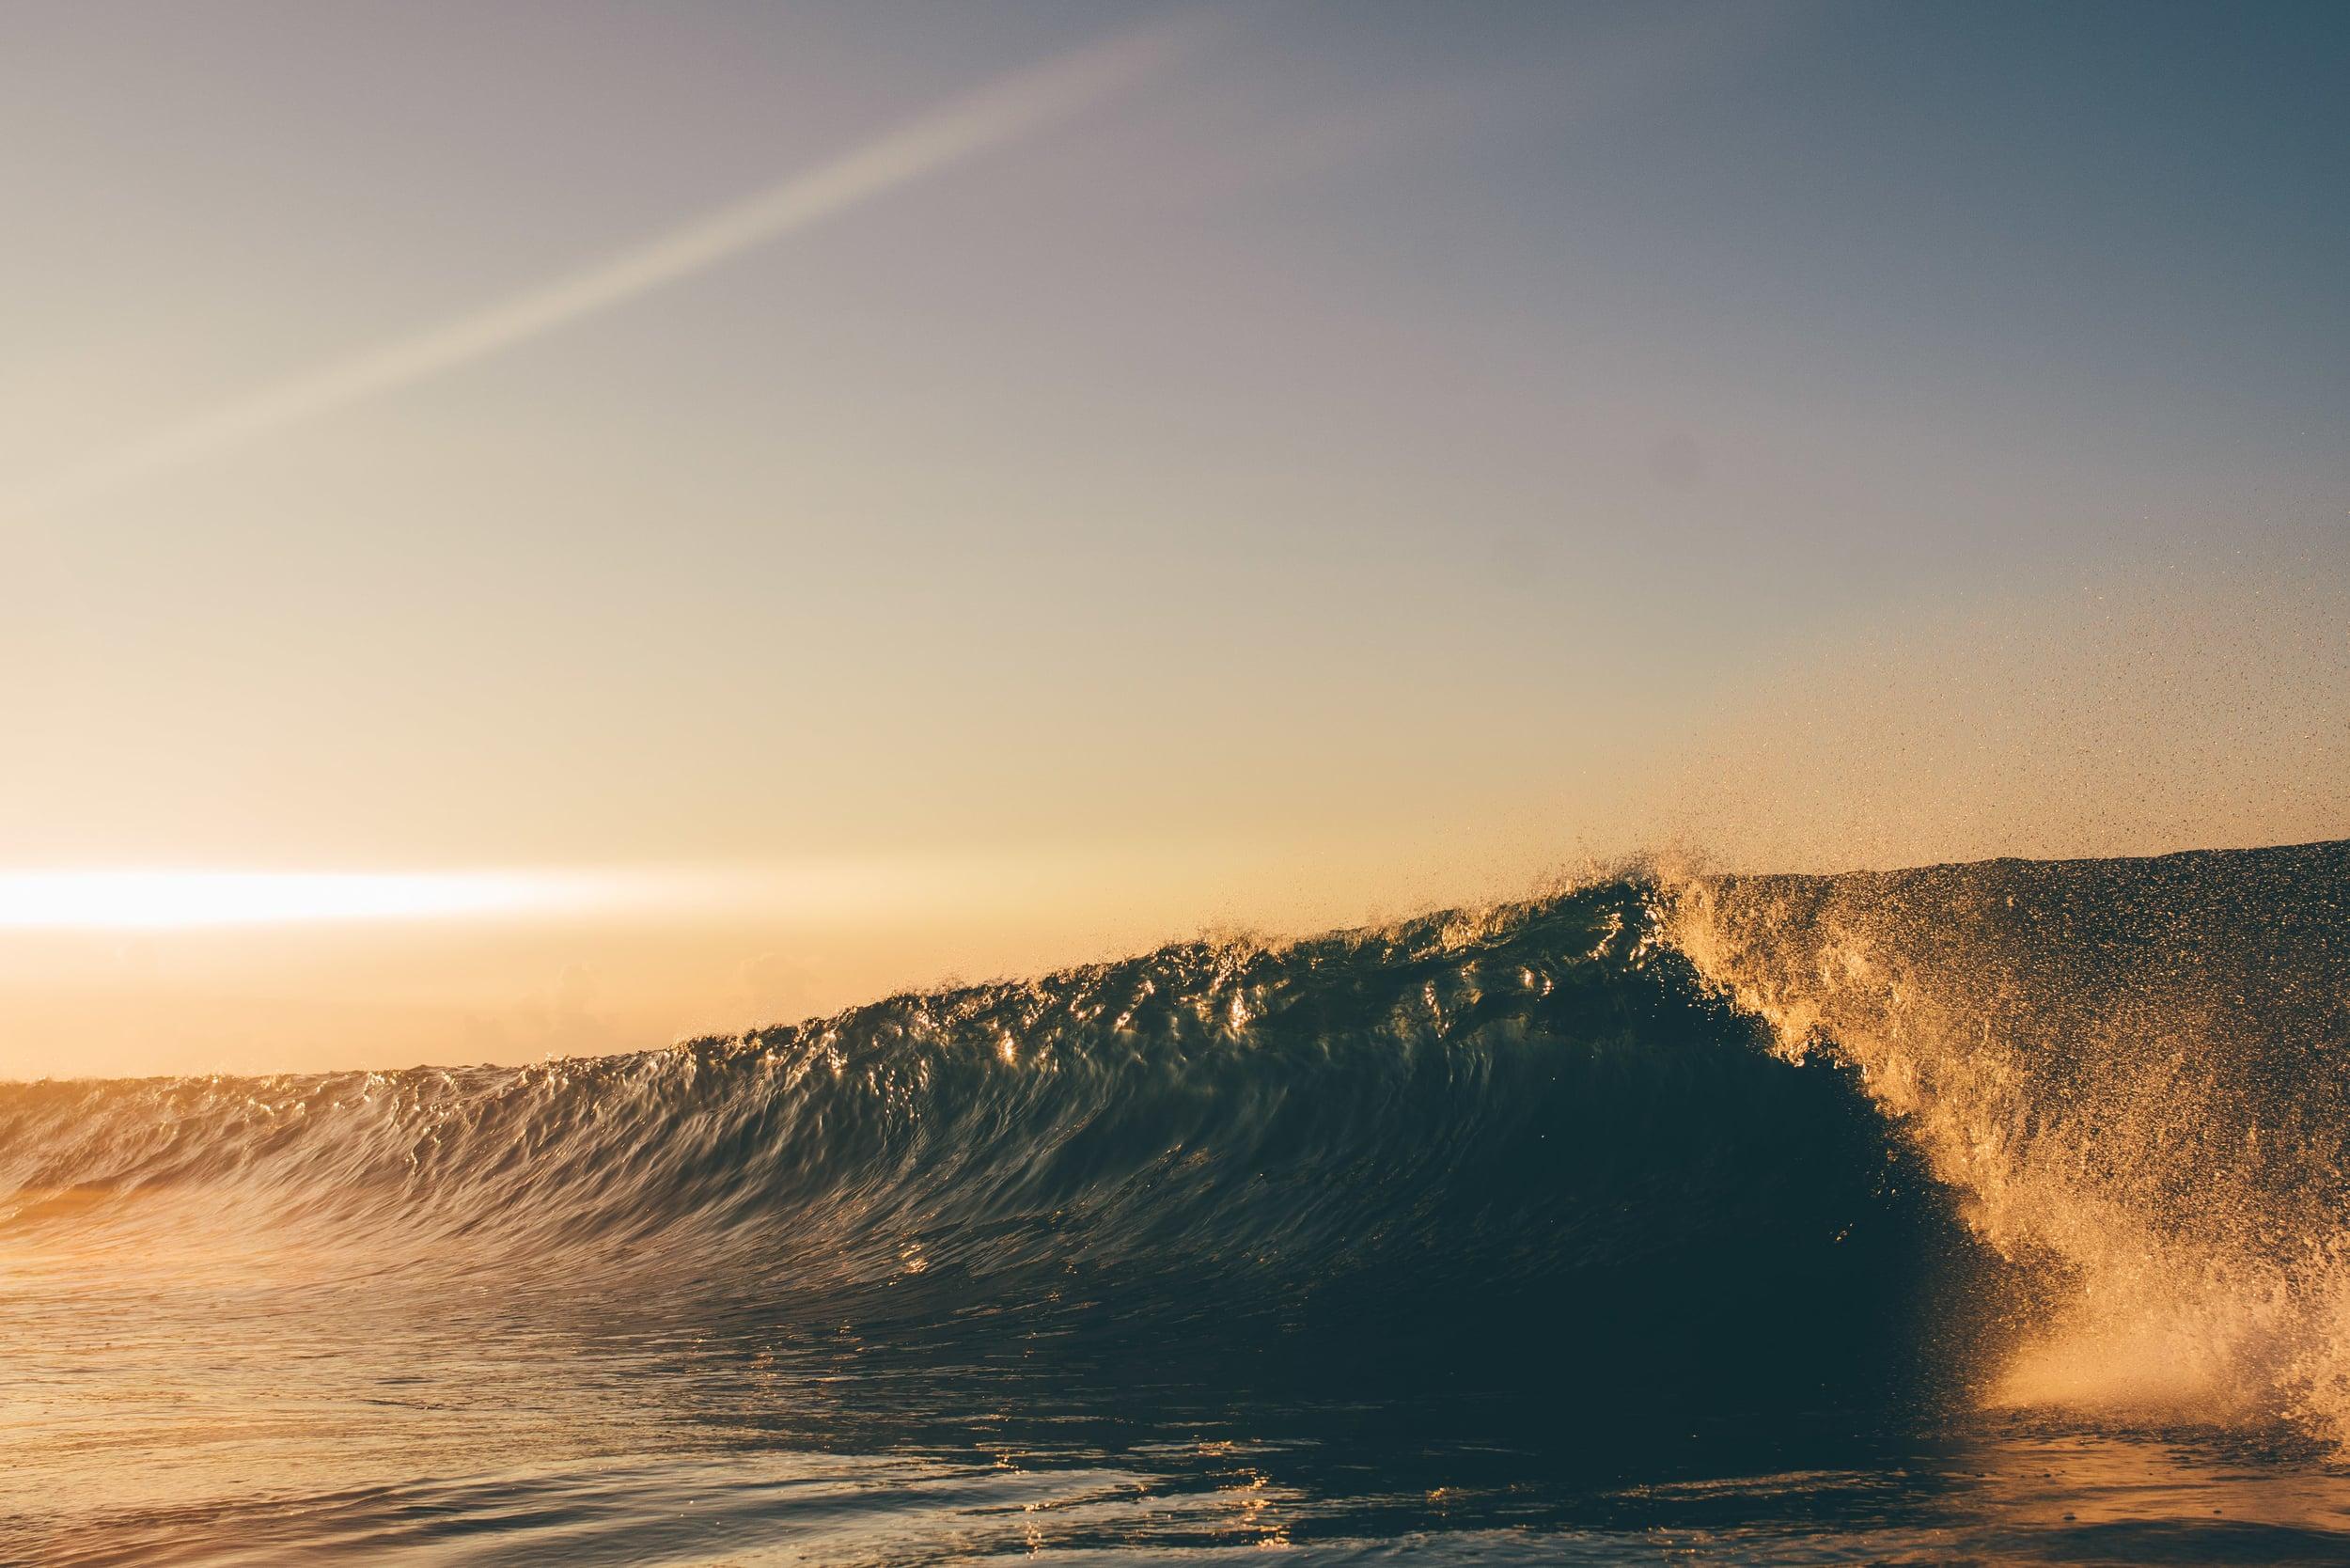 bryce-johnson-photography-kauai-hawaii-surfing-a7rii-aquatech-water-ocean-16.jpg